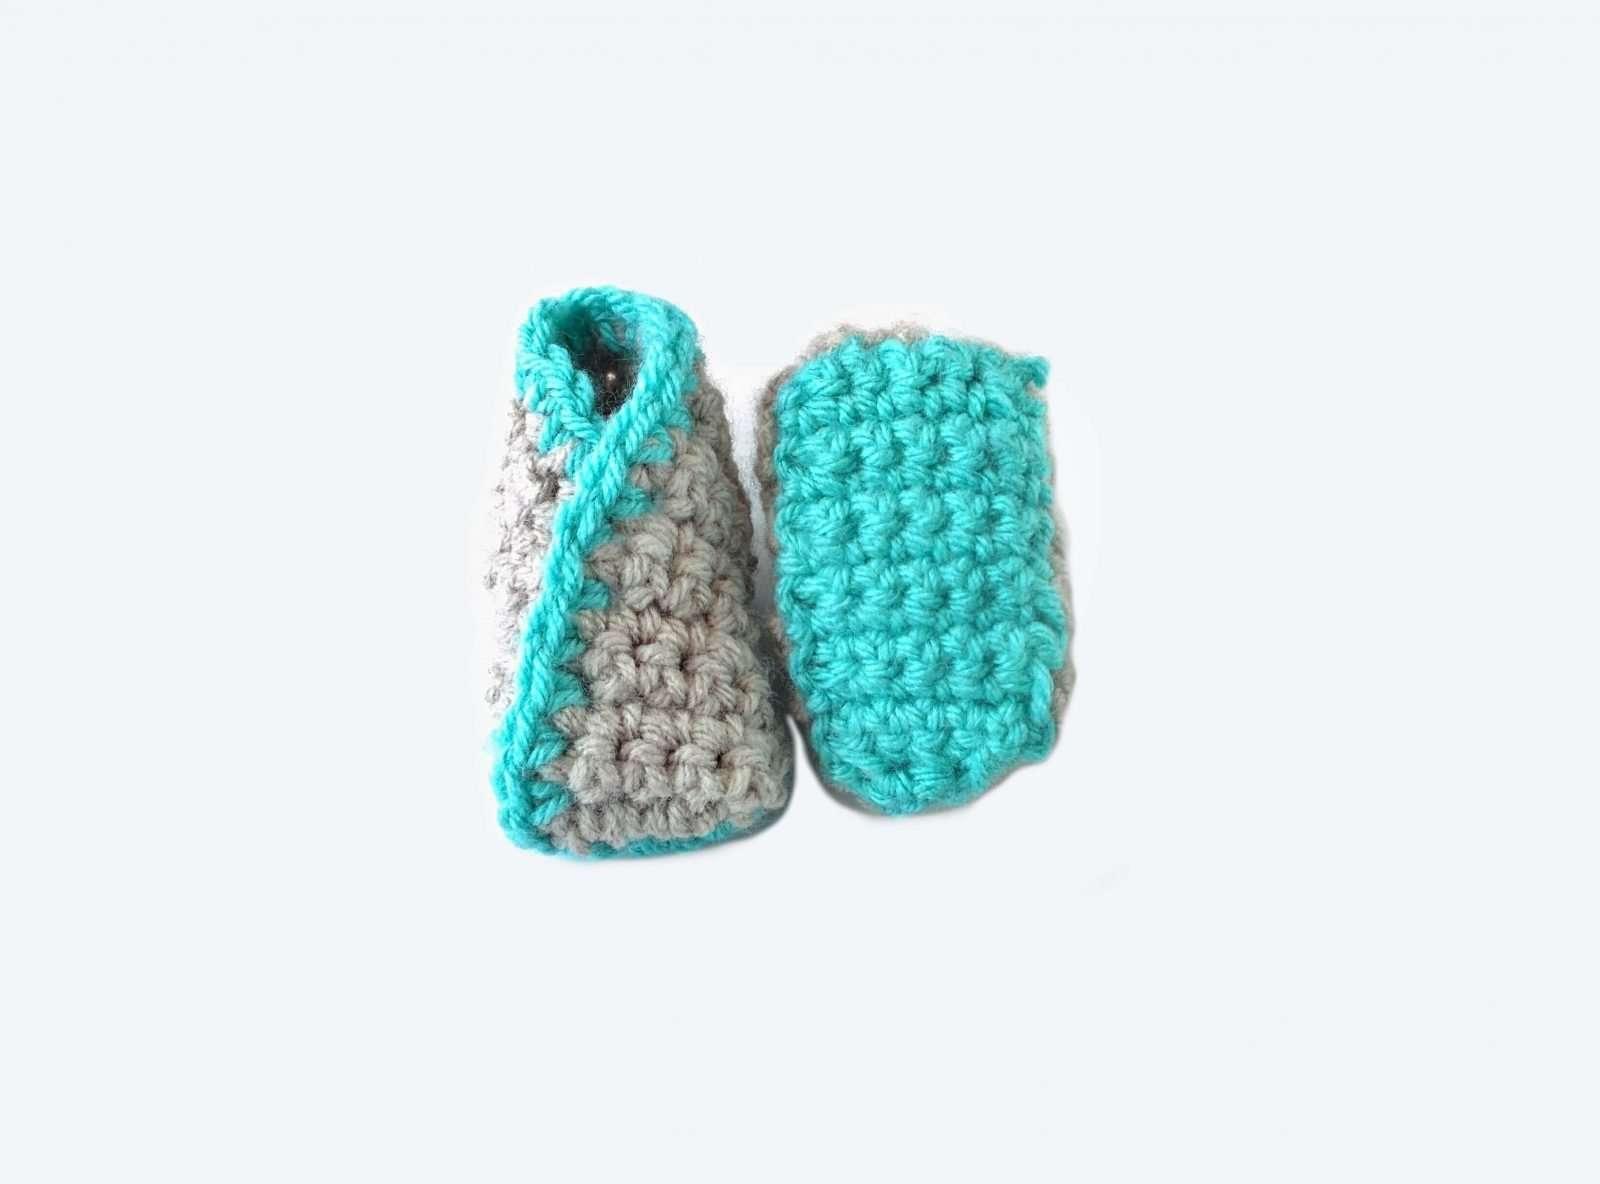 kimono crochet baby booties pattern